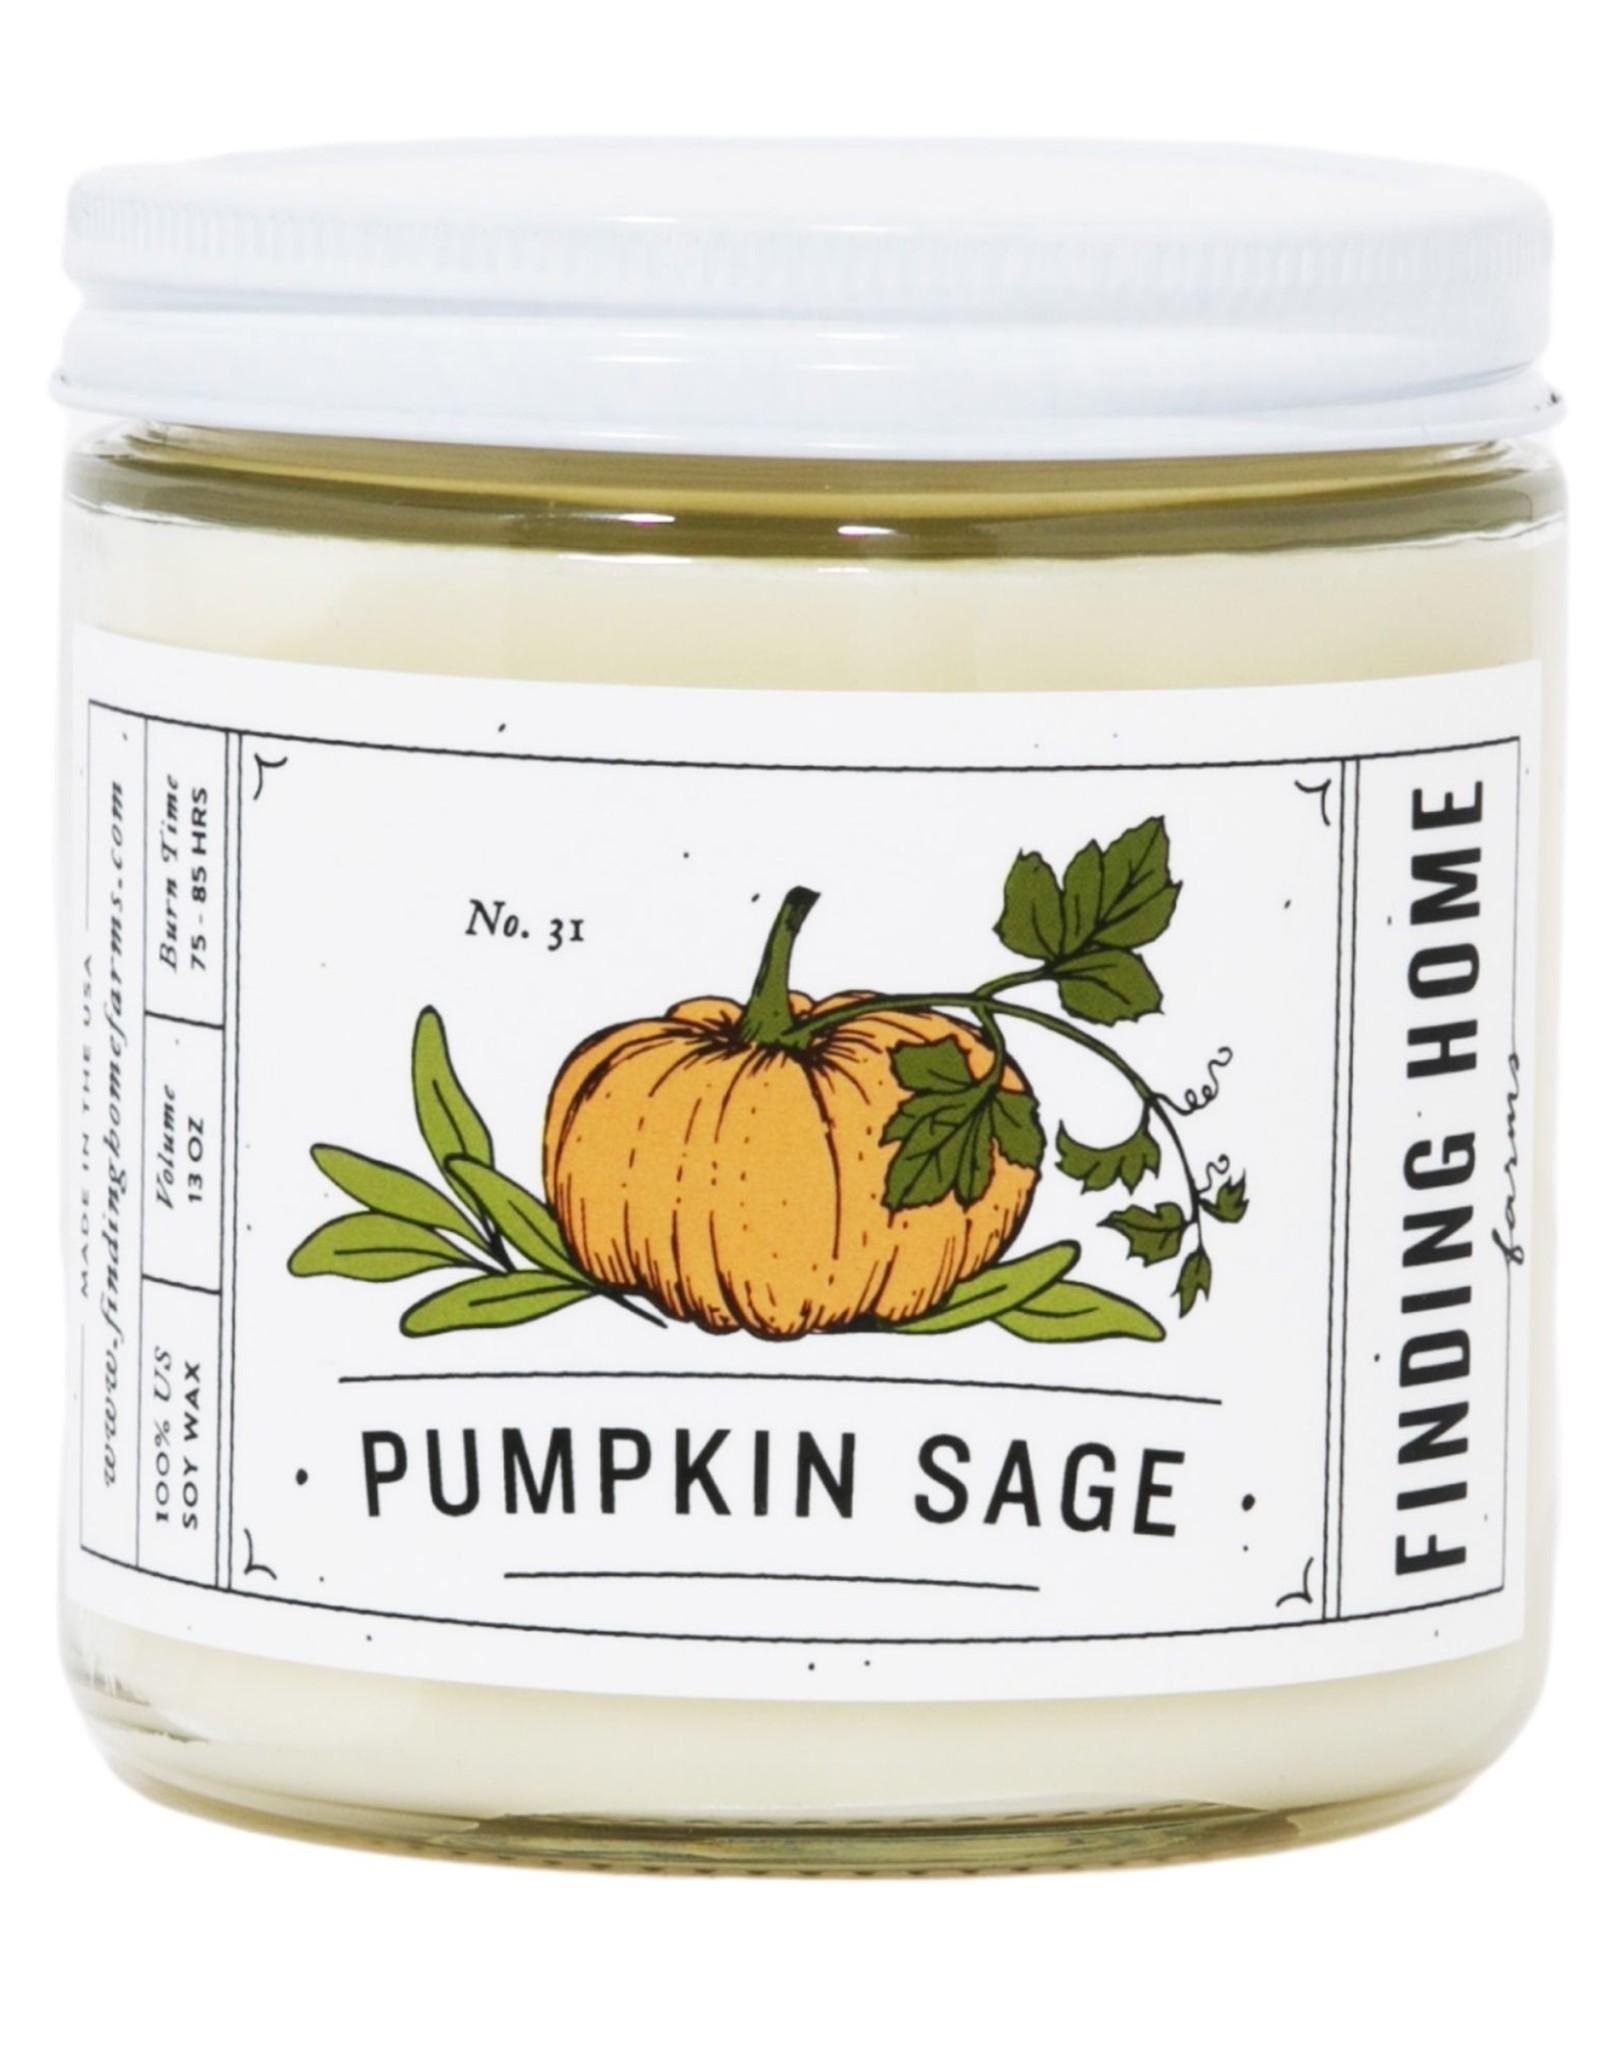 Finding Home Farms Pumpkin Sage Candle - 13oz